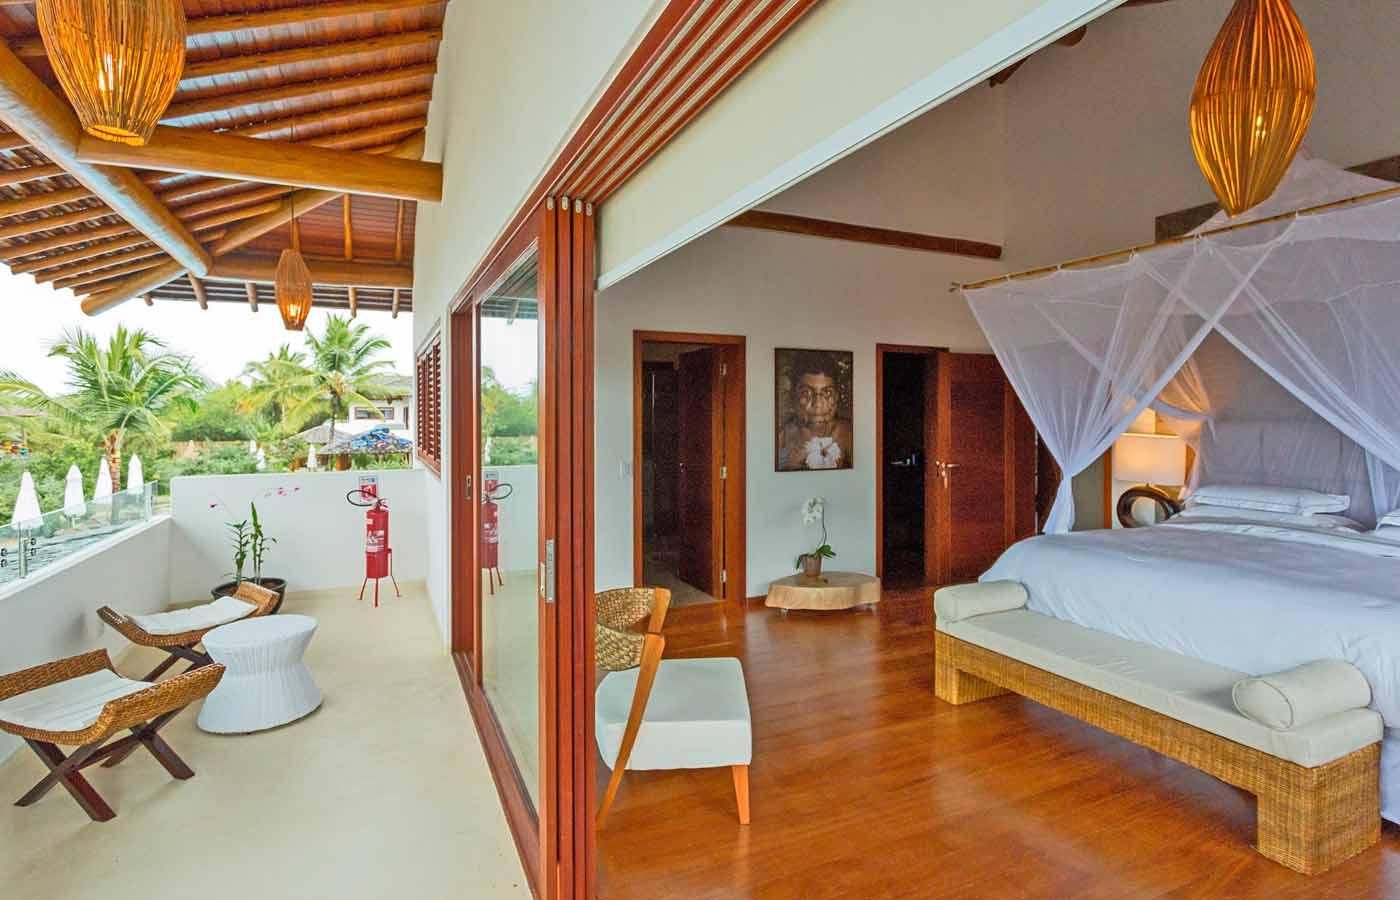 Hotel Campo Bahia - luxury holidays to Bahia Brazil